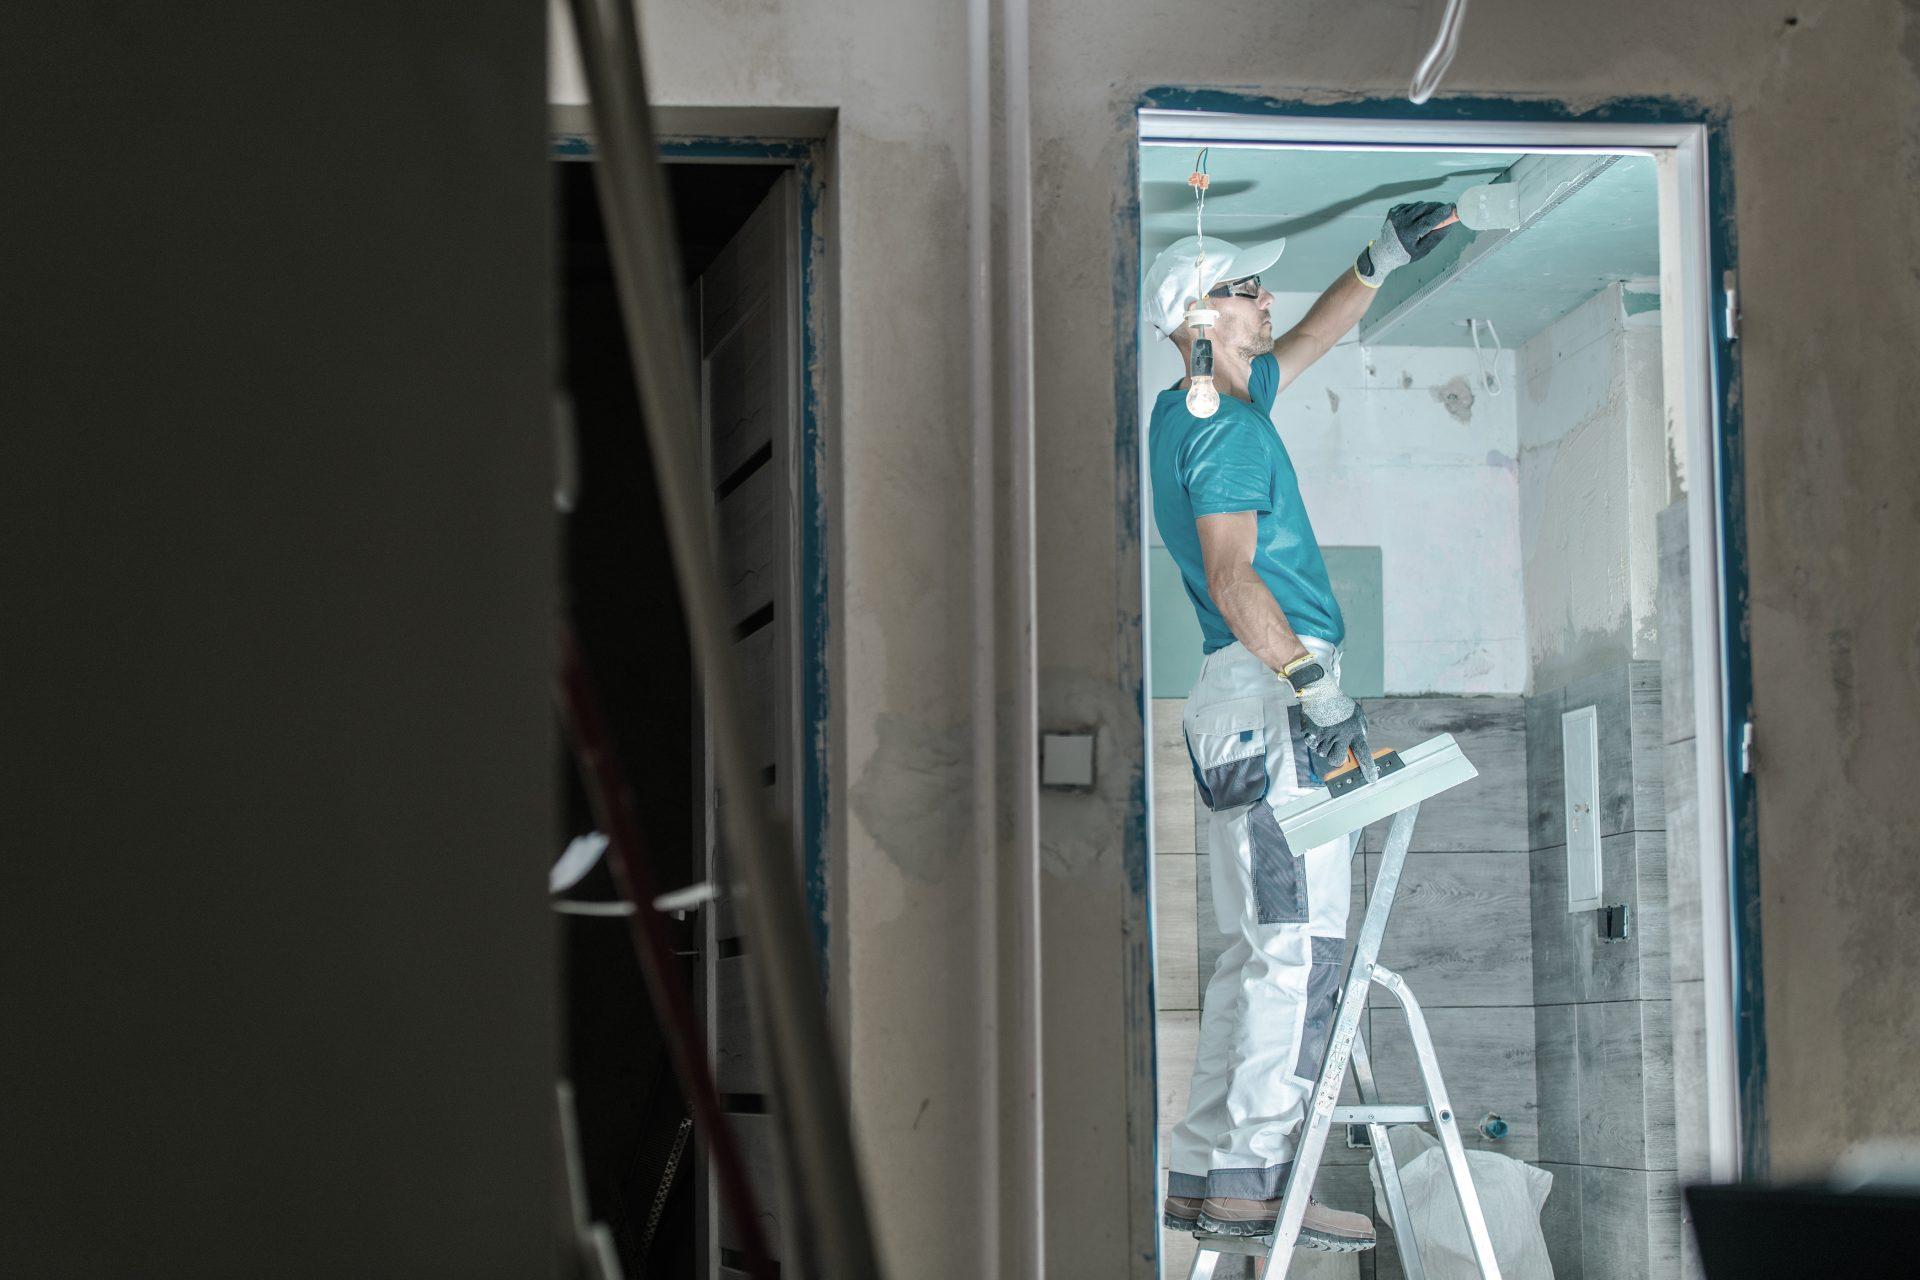 apartment-remodeling-job-4TXFQA3